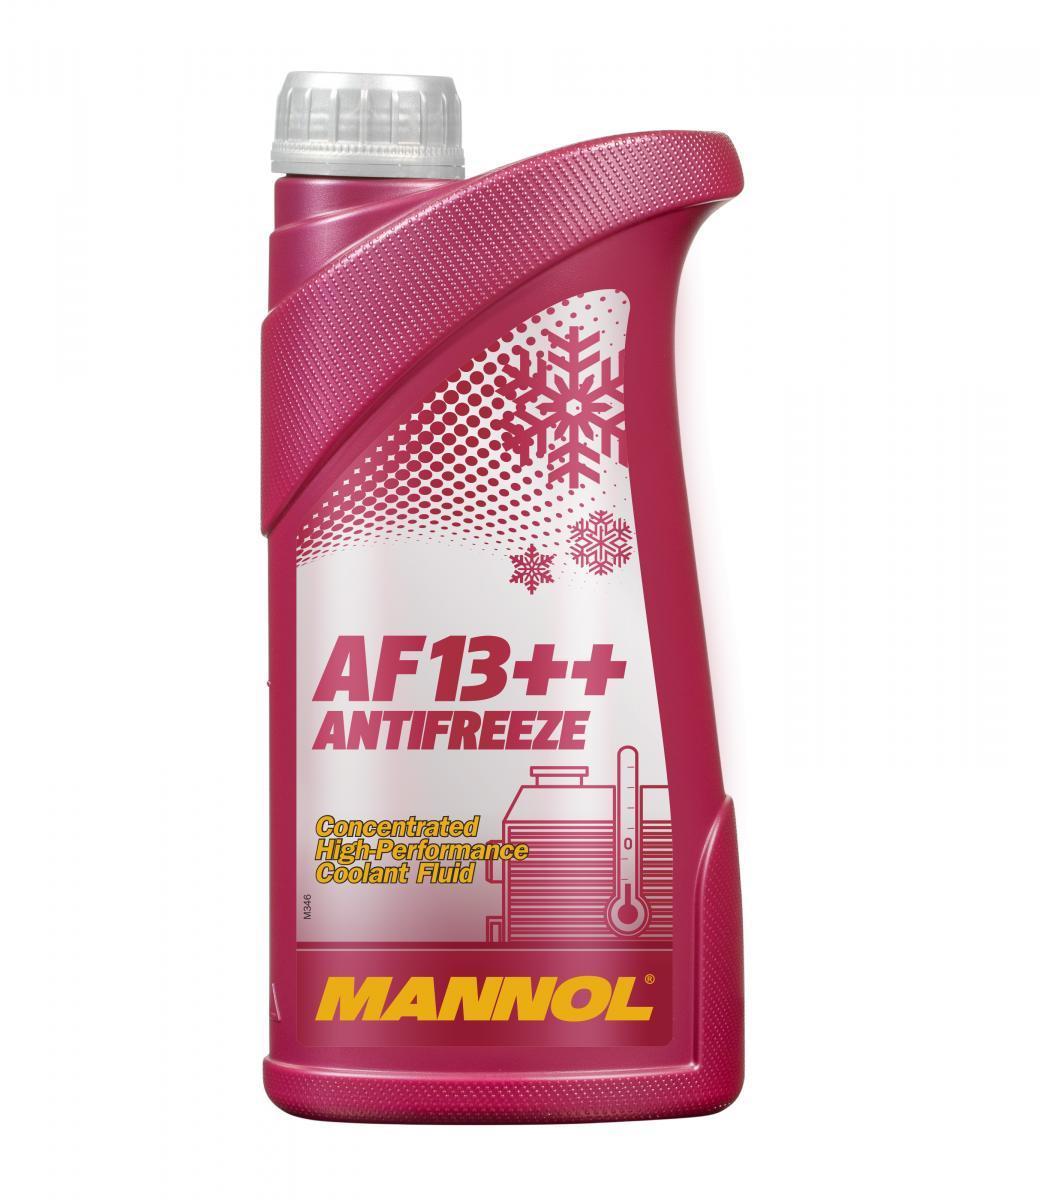 Buy MANNOL Antifreeze MN4115-1 truck